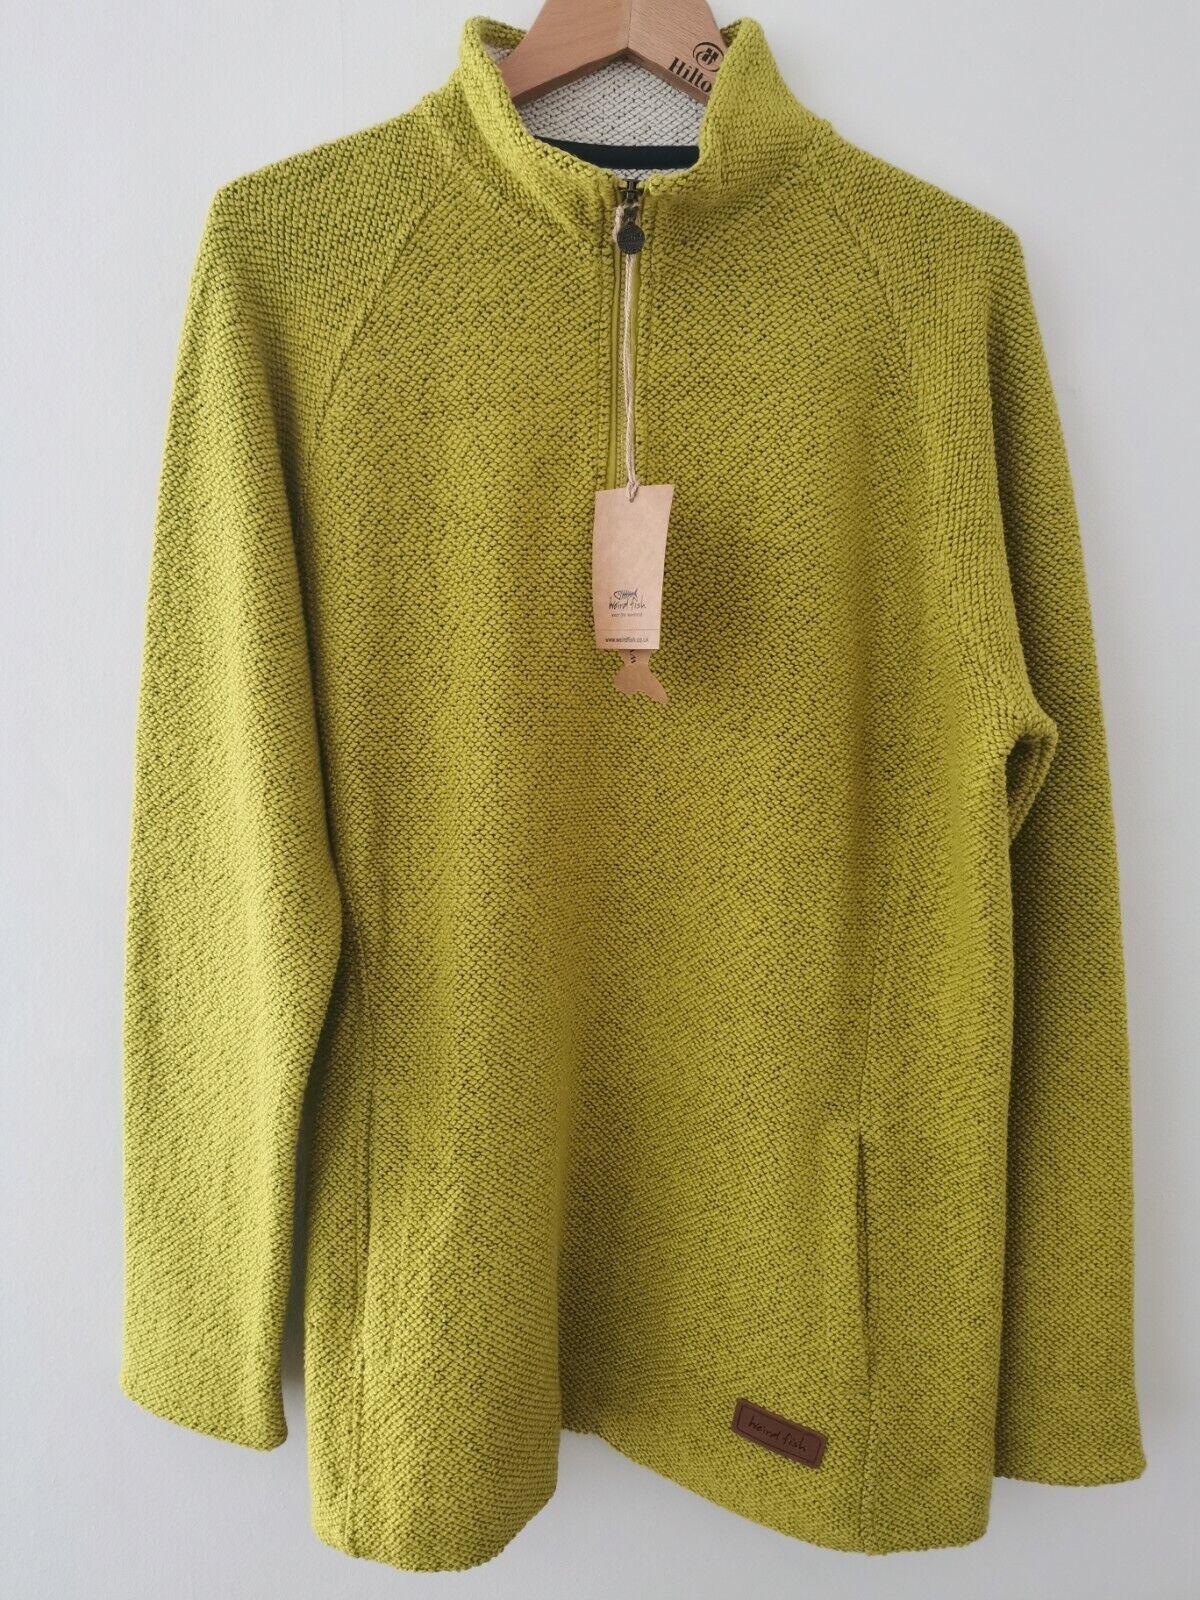 BNWT Weird Fish Citronella Macaroni 1/4 Zip Sweatshirt Size UK 18 * NEW RRP